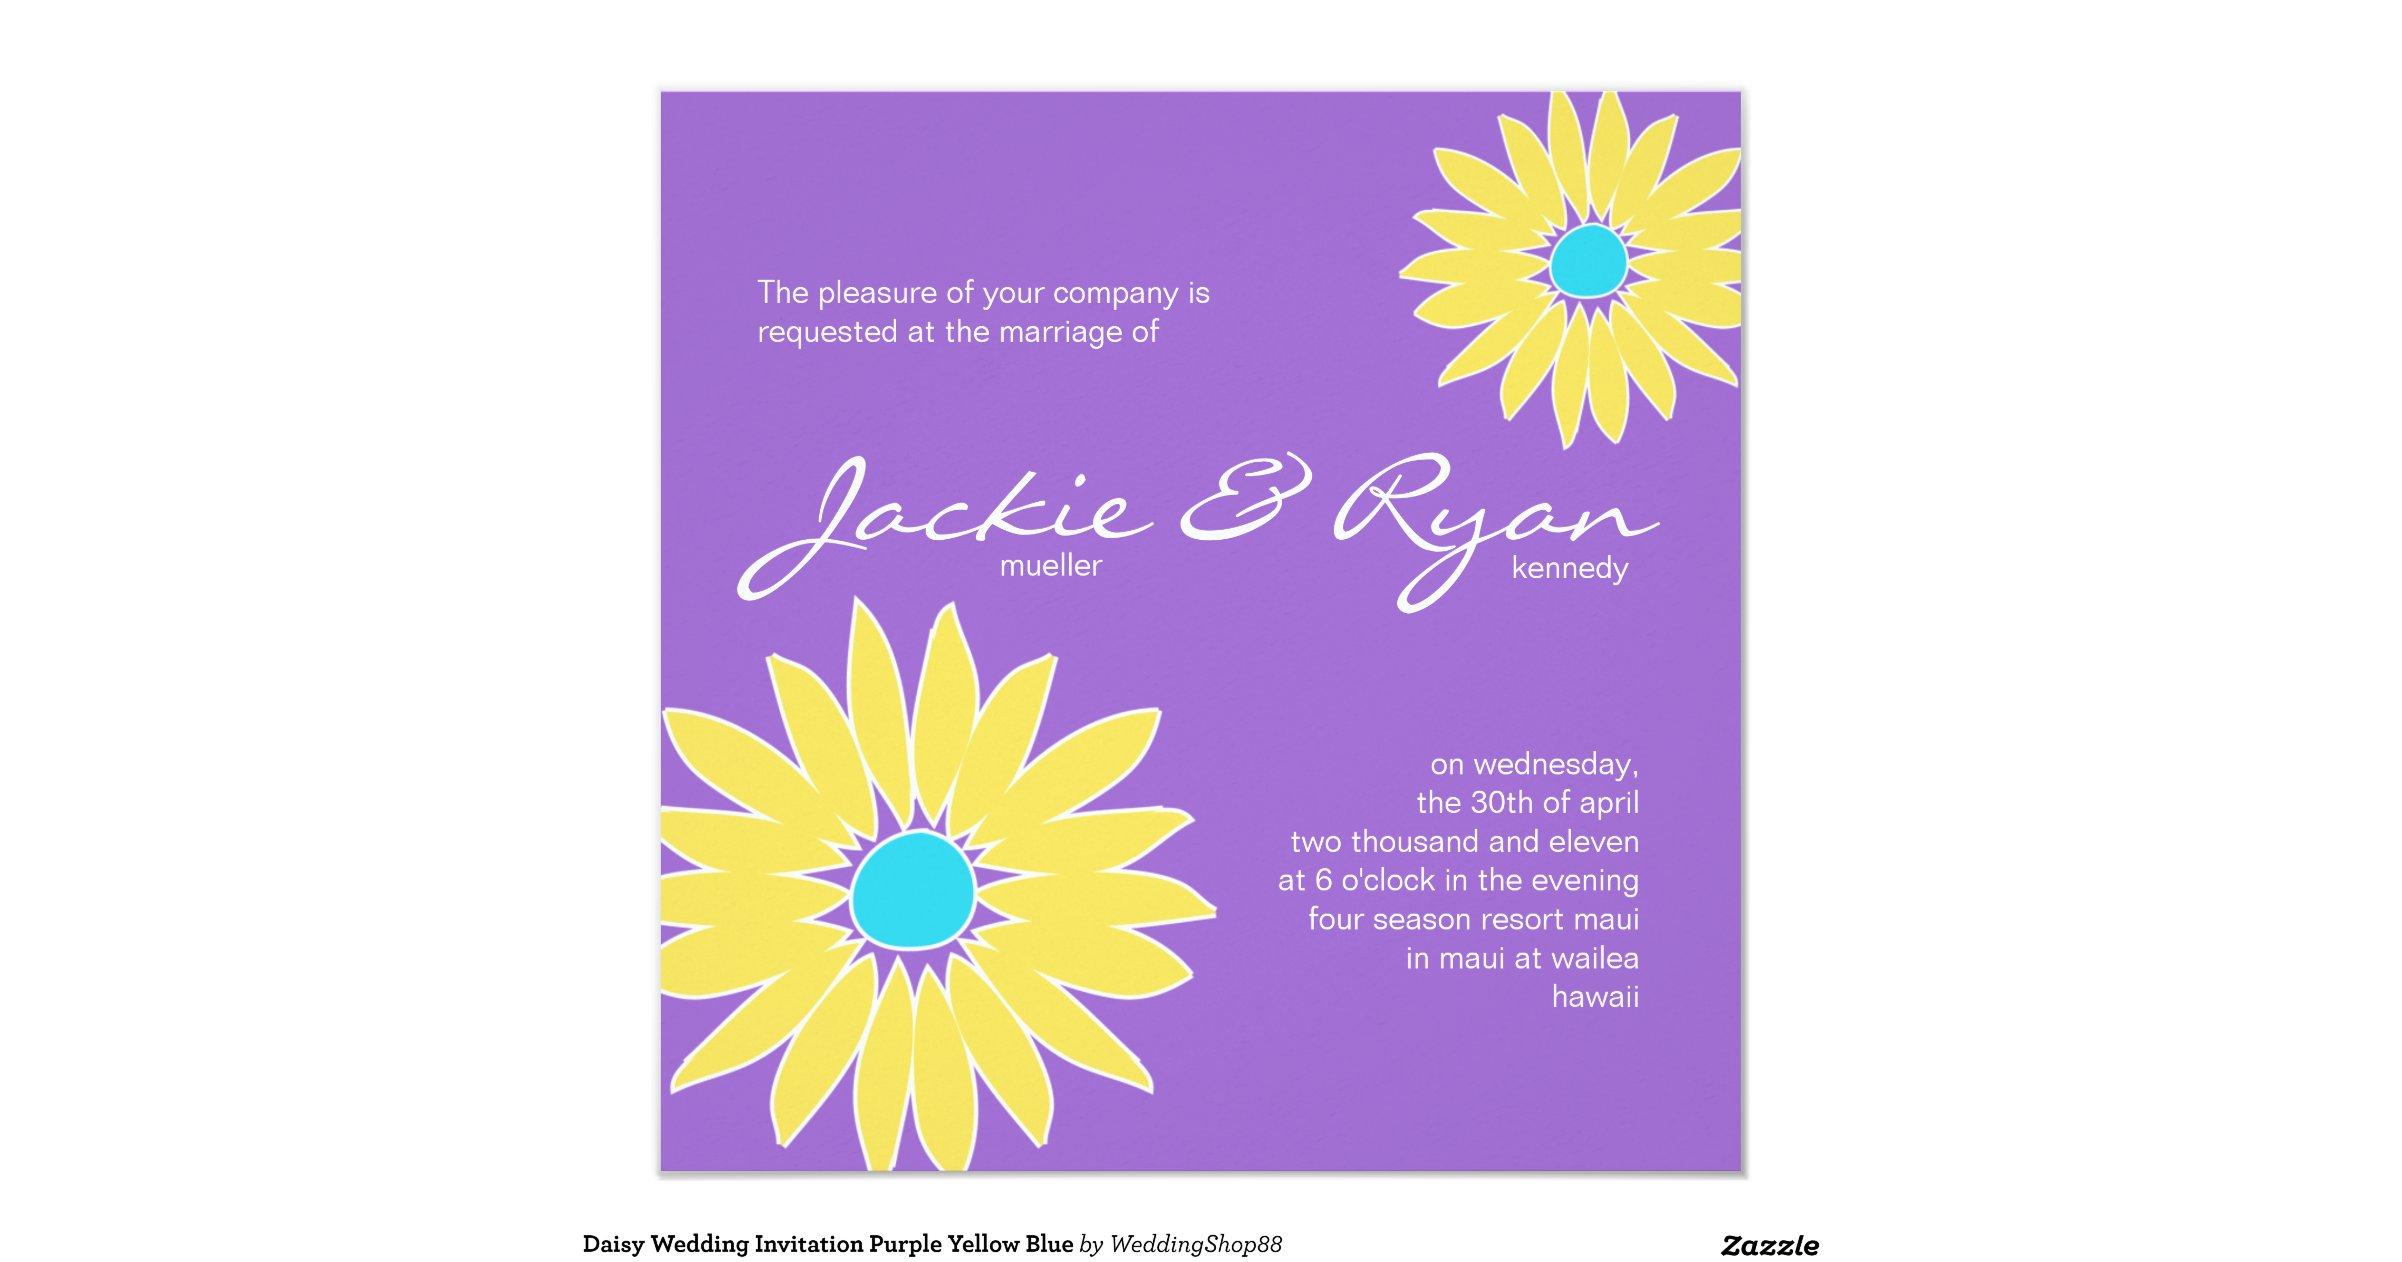 Purple And Blue Wedding Invitations: Daisy_wedding_invitation_purple_yellow_blue